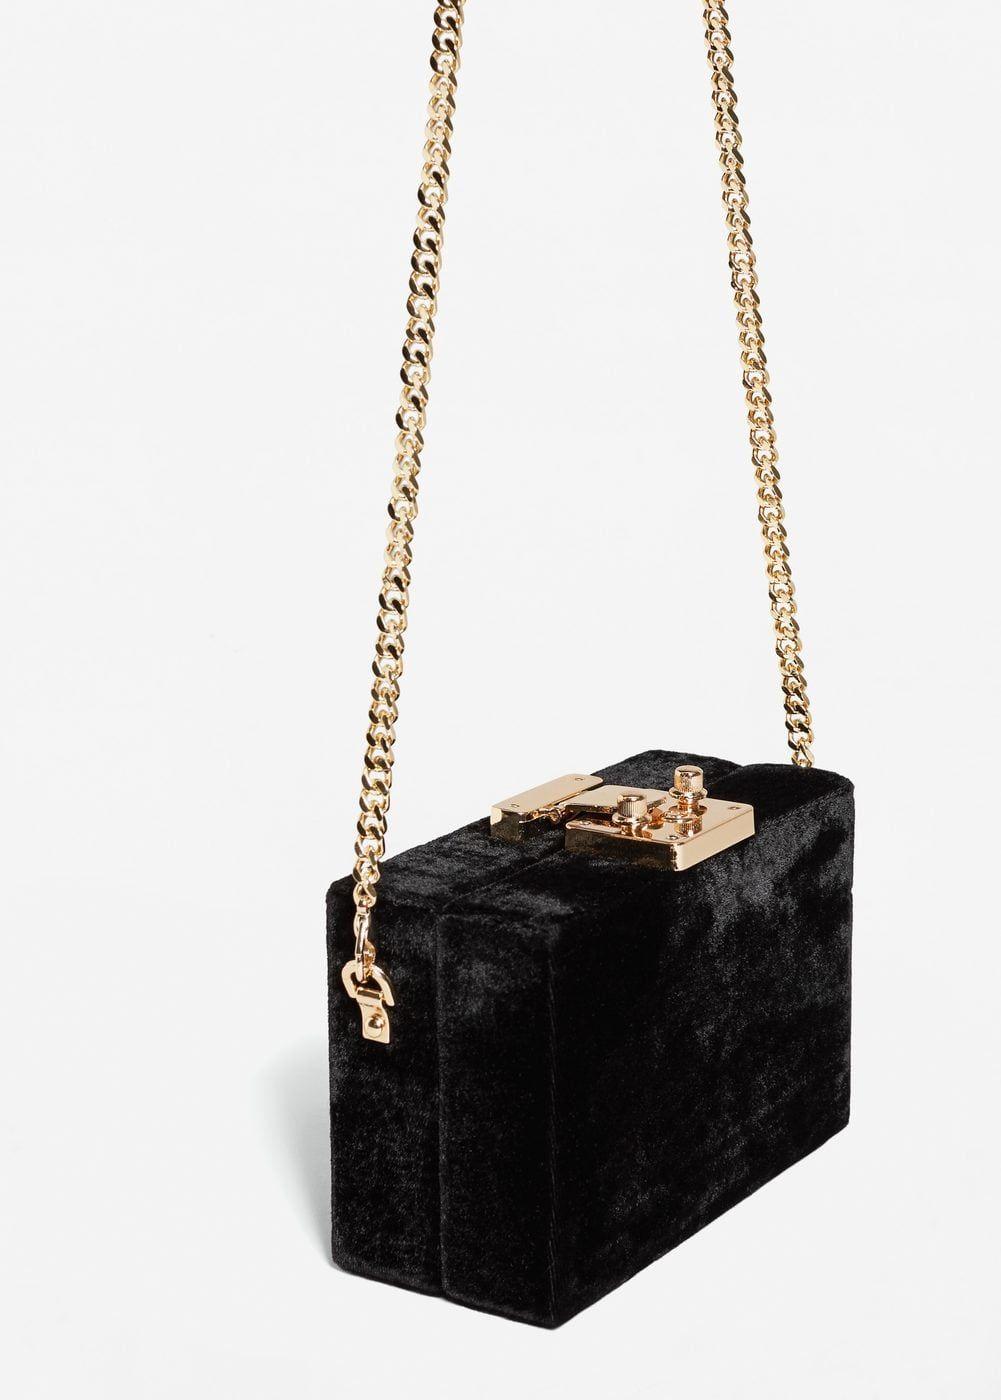 Kadife kutu çanta - Kadın  e5206e5d971e7